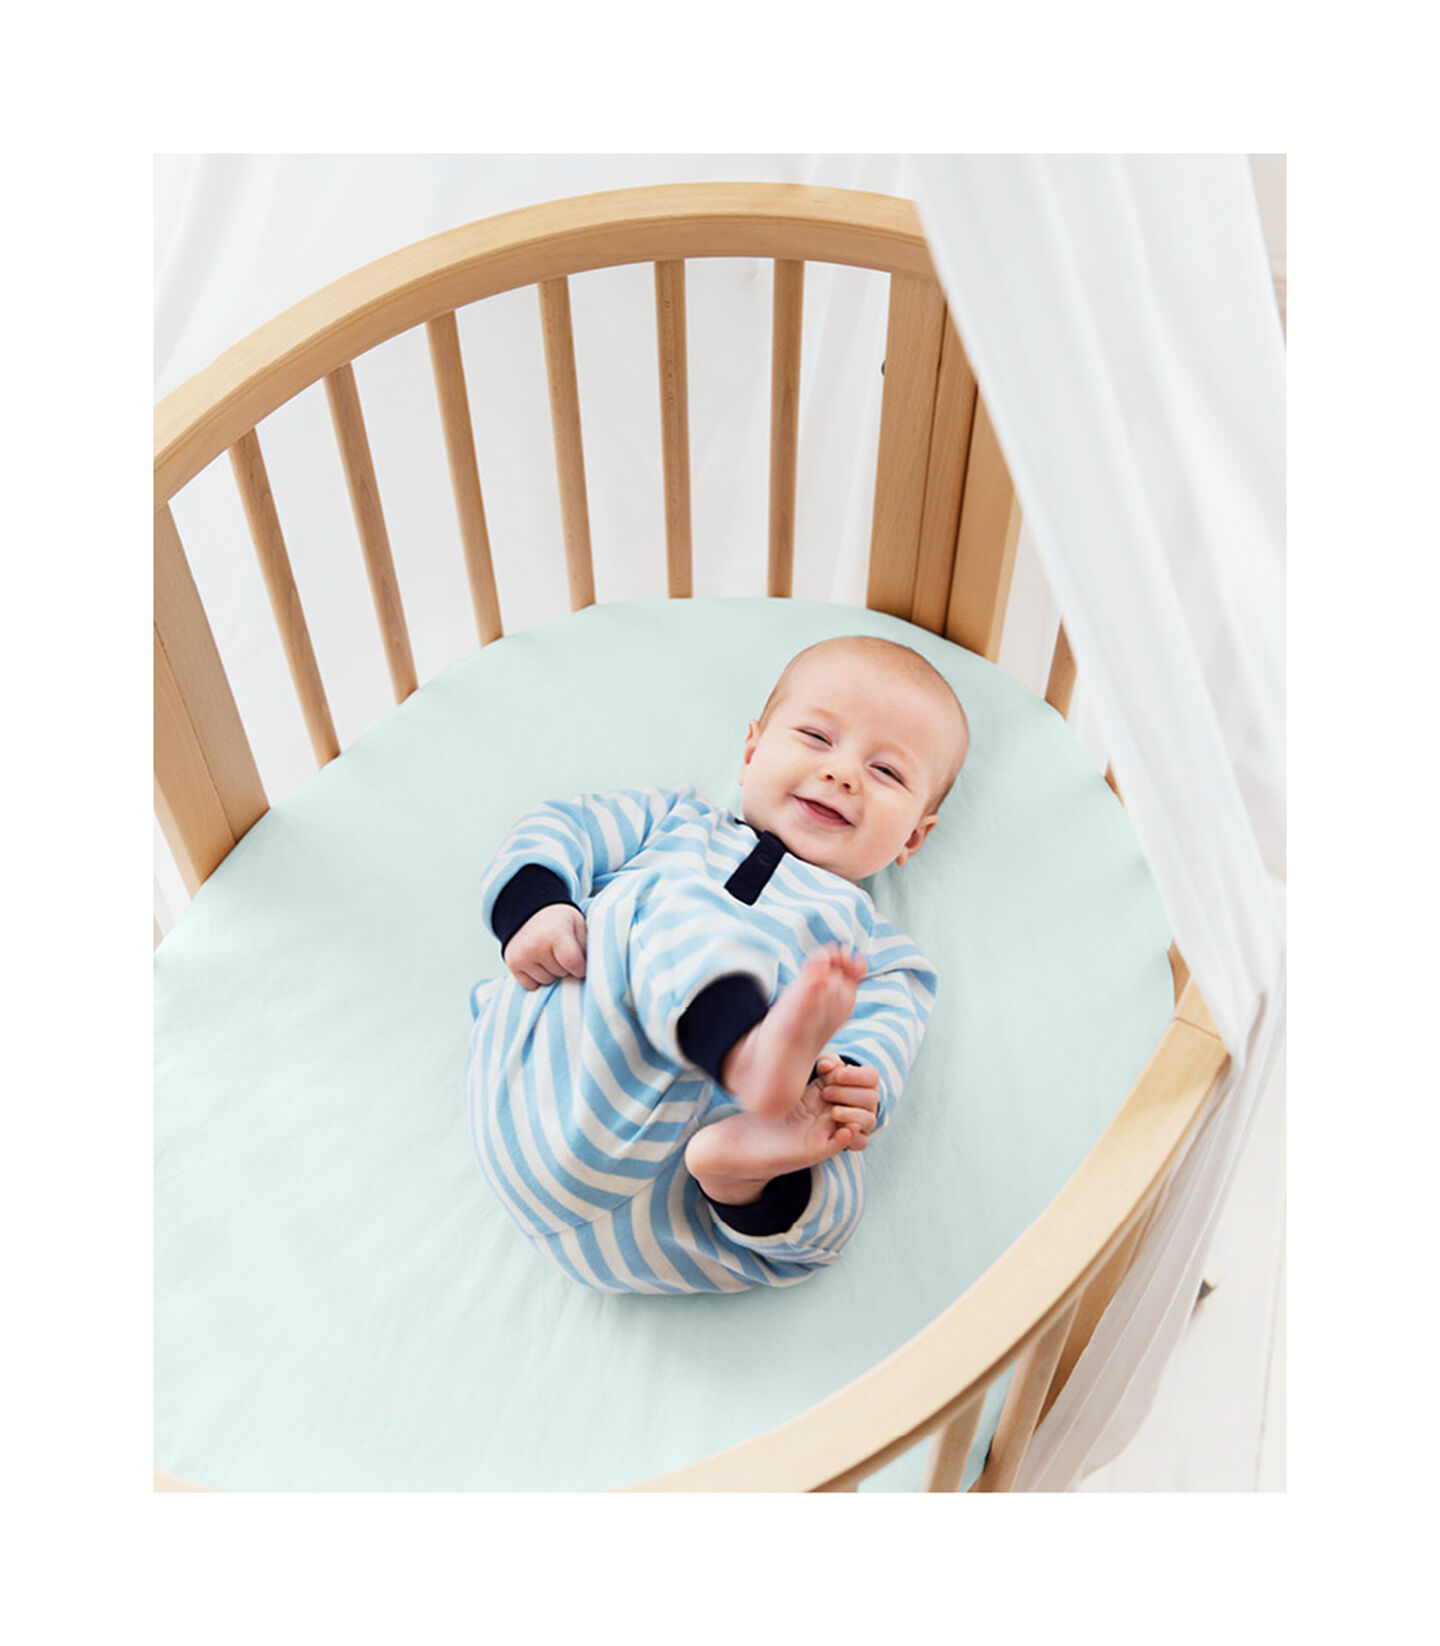 Stokke® Sleepi™ Mini Spannbettlaken Powder Blue, Powder Blue, mainview view 2